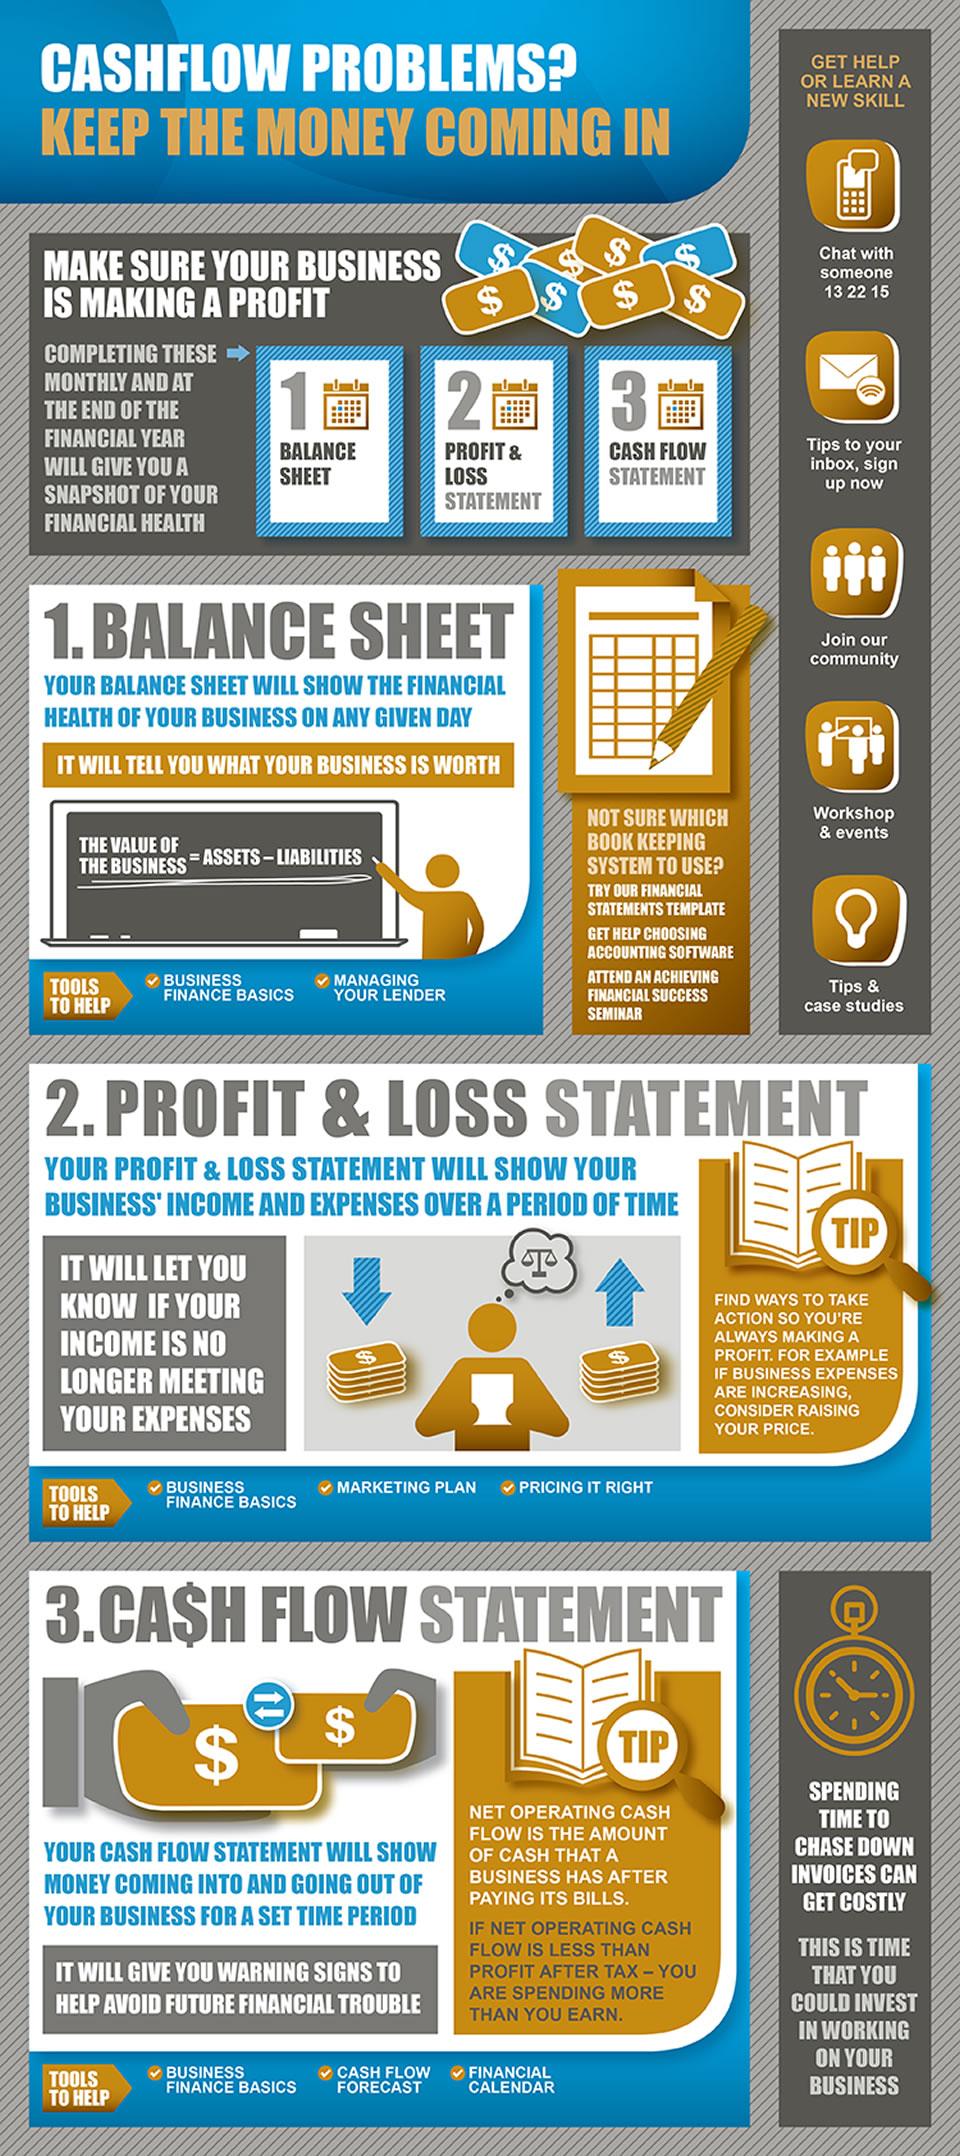 Cashflow-problems-infographic